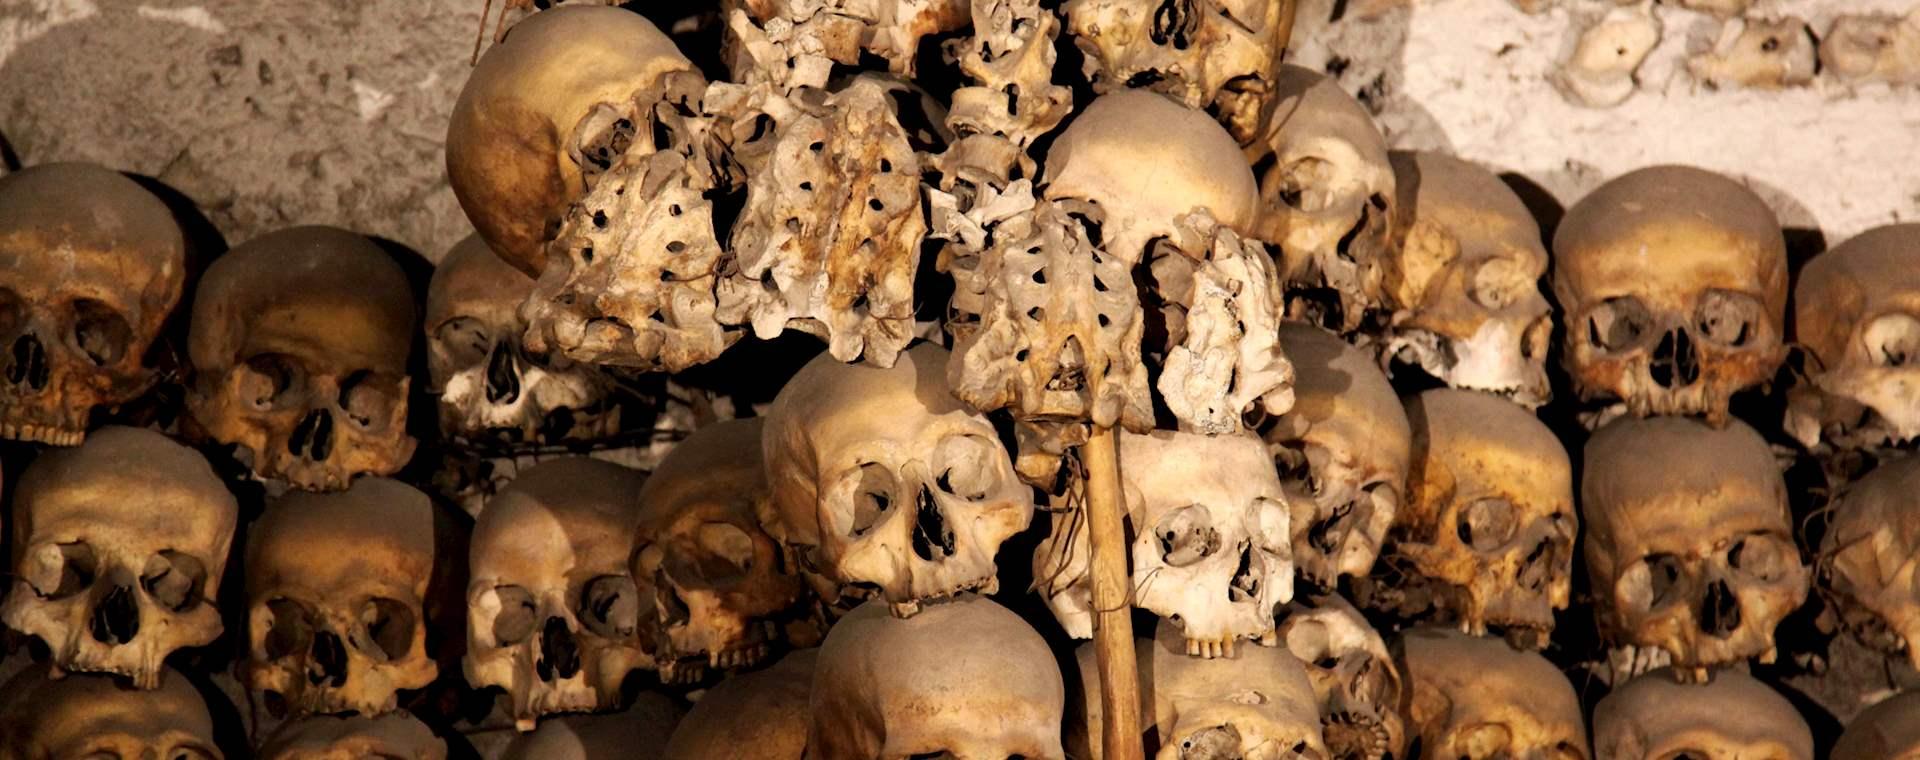 The Original Rome Crypts & Catacombs Tour